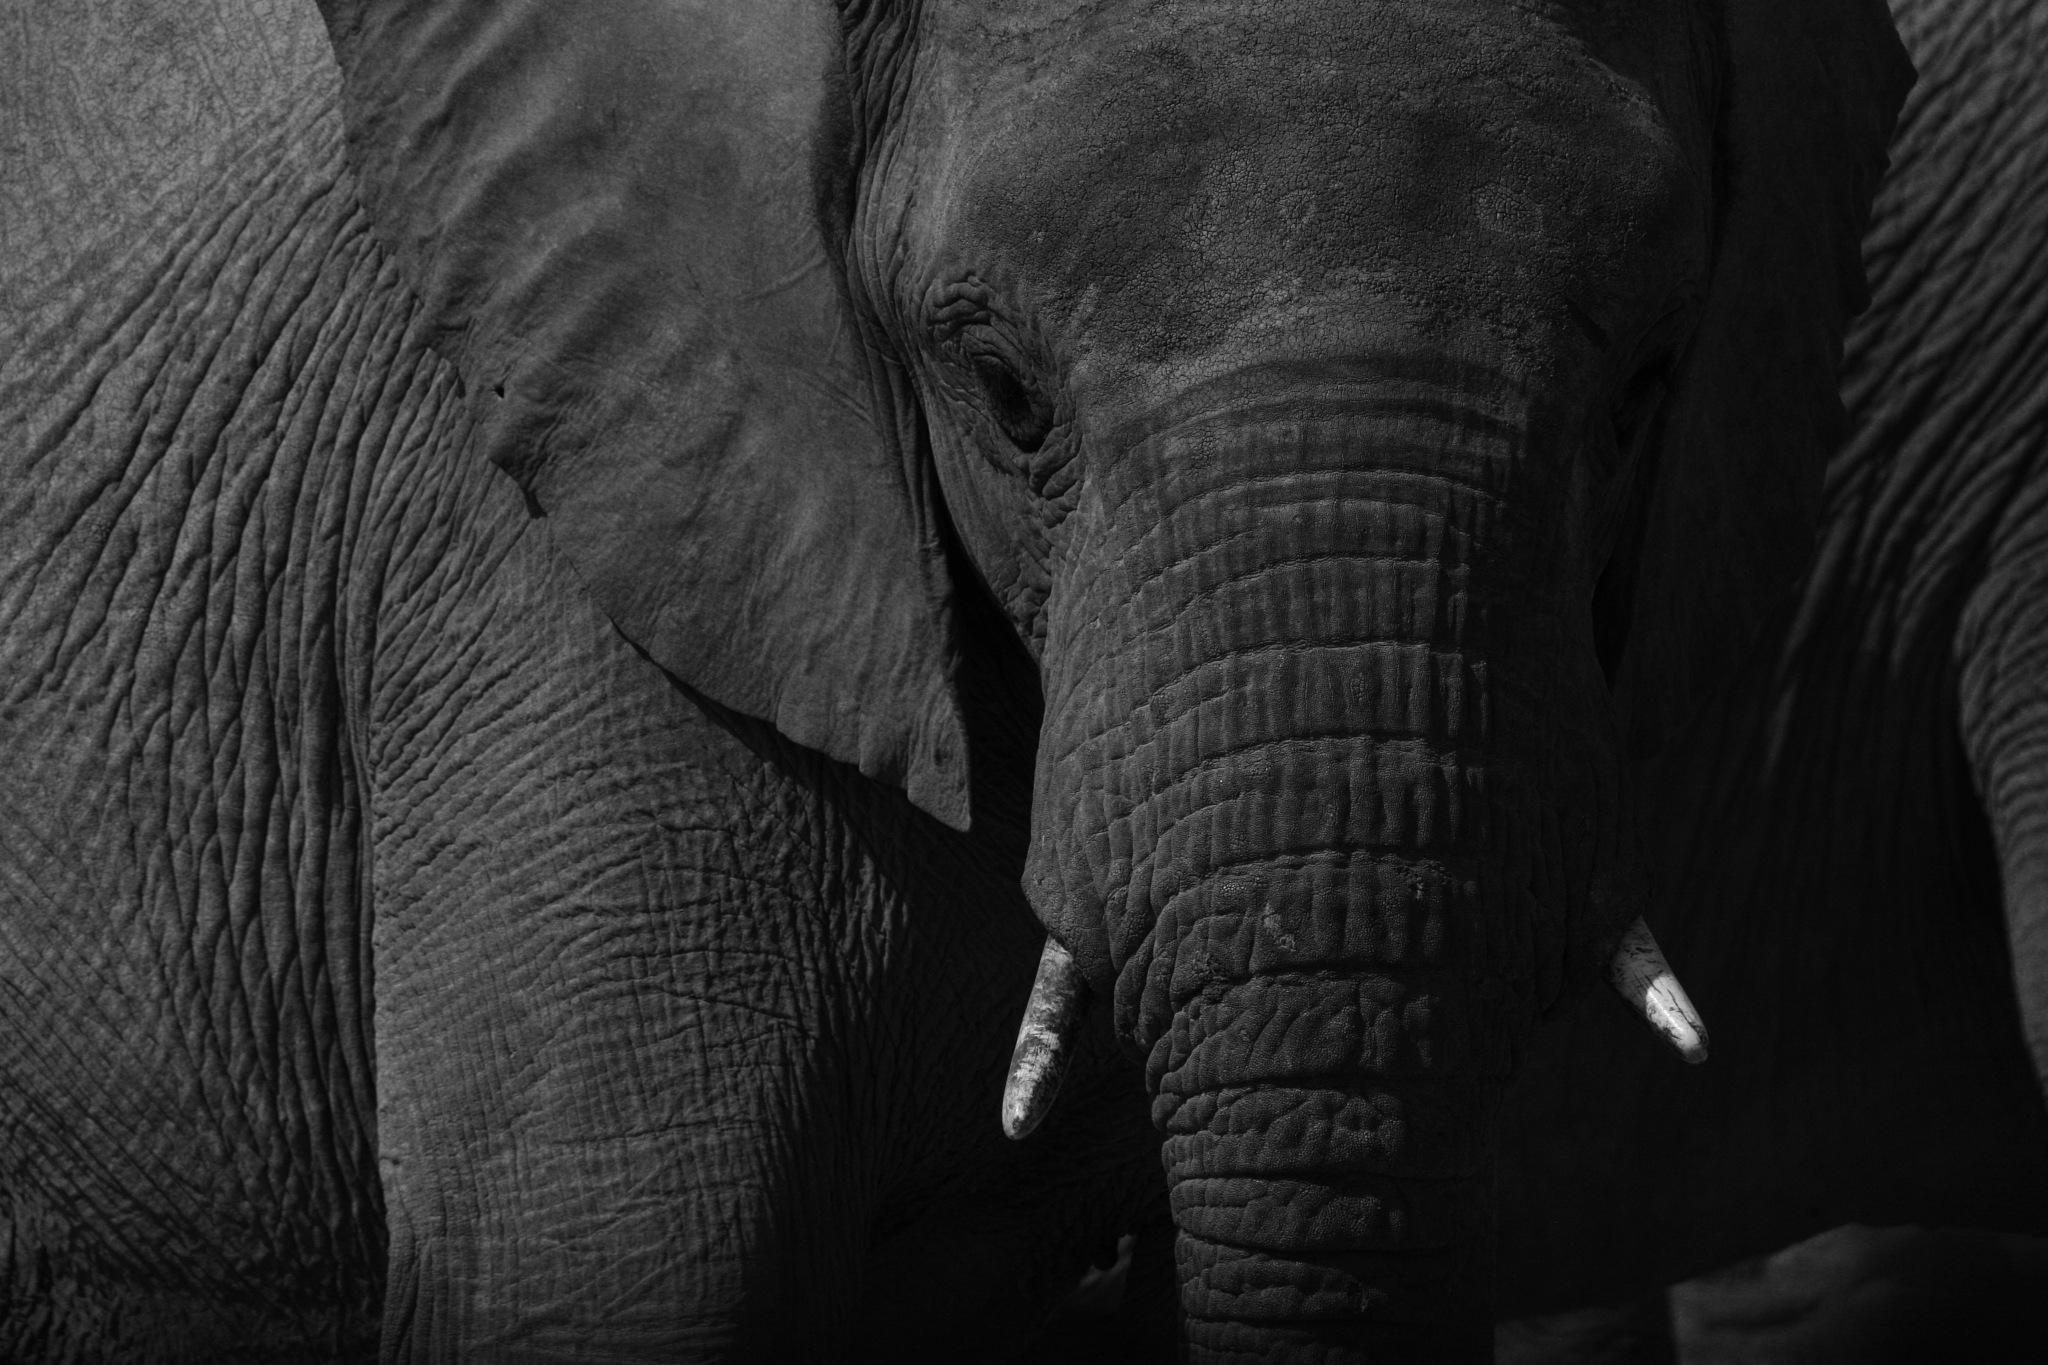 b & w elephant  by Marianna the fish